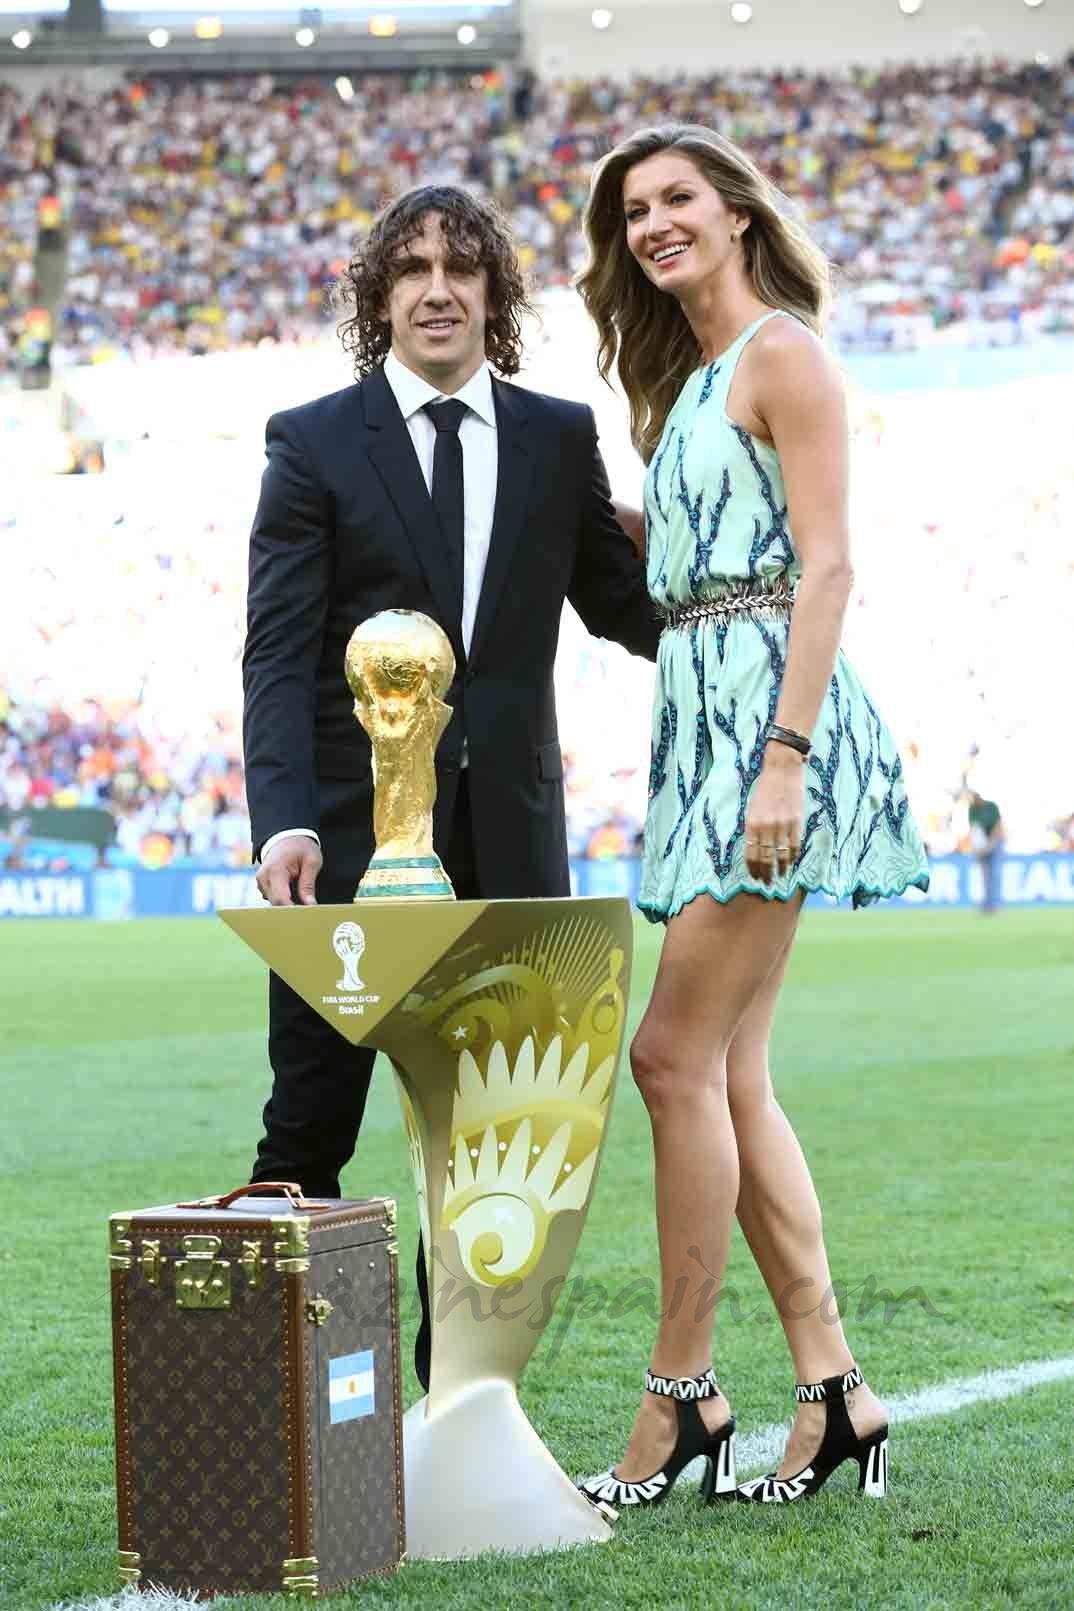 ¿Cuánto mide Carles Puyol? - Altura - Real height E1e448b4d7d296da39627394f975df23